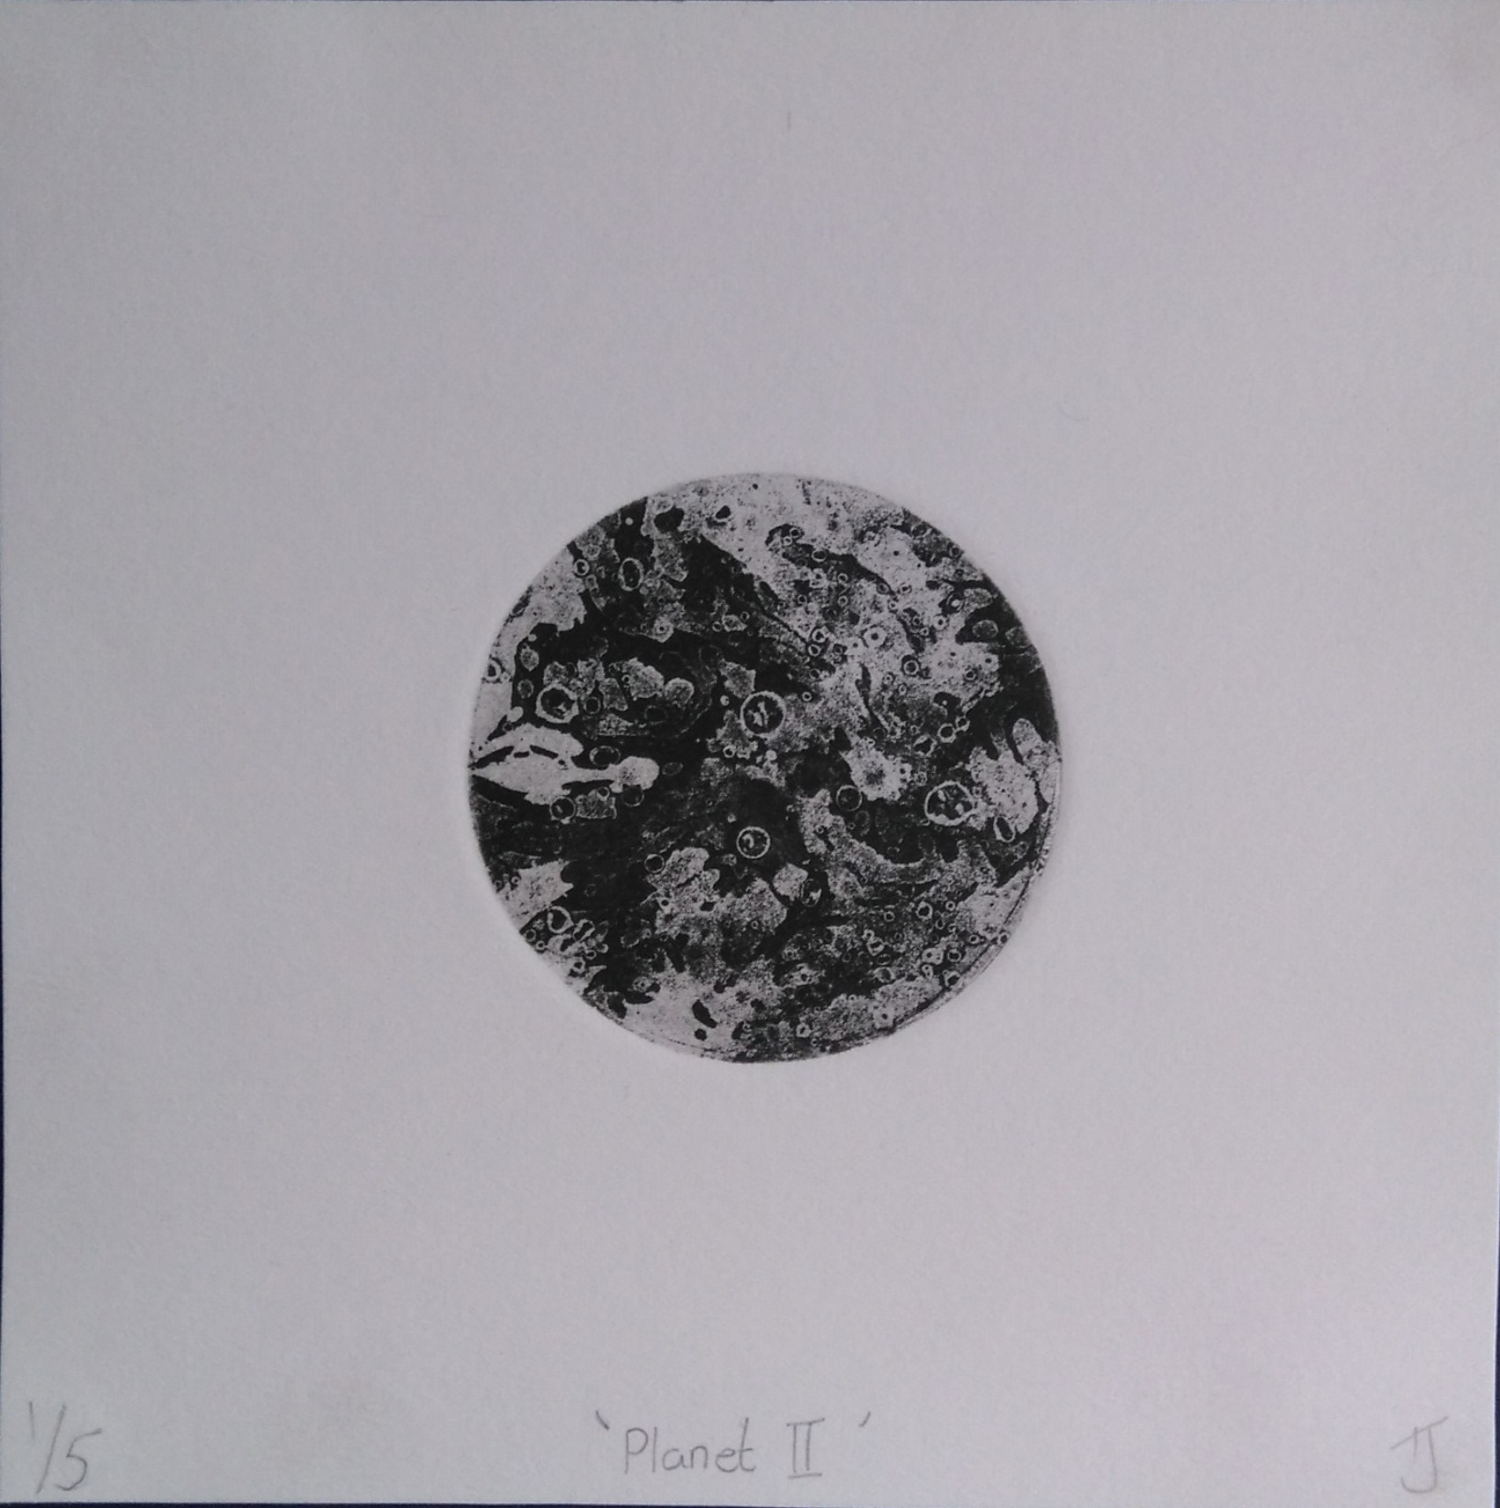 Planet ll by Tara Johnston